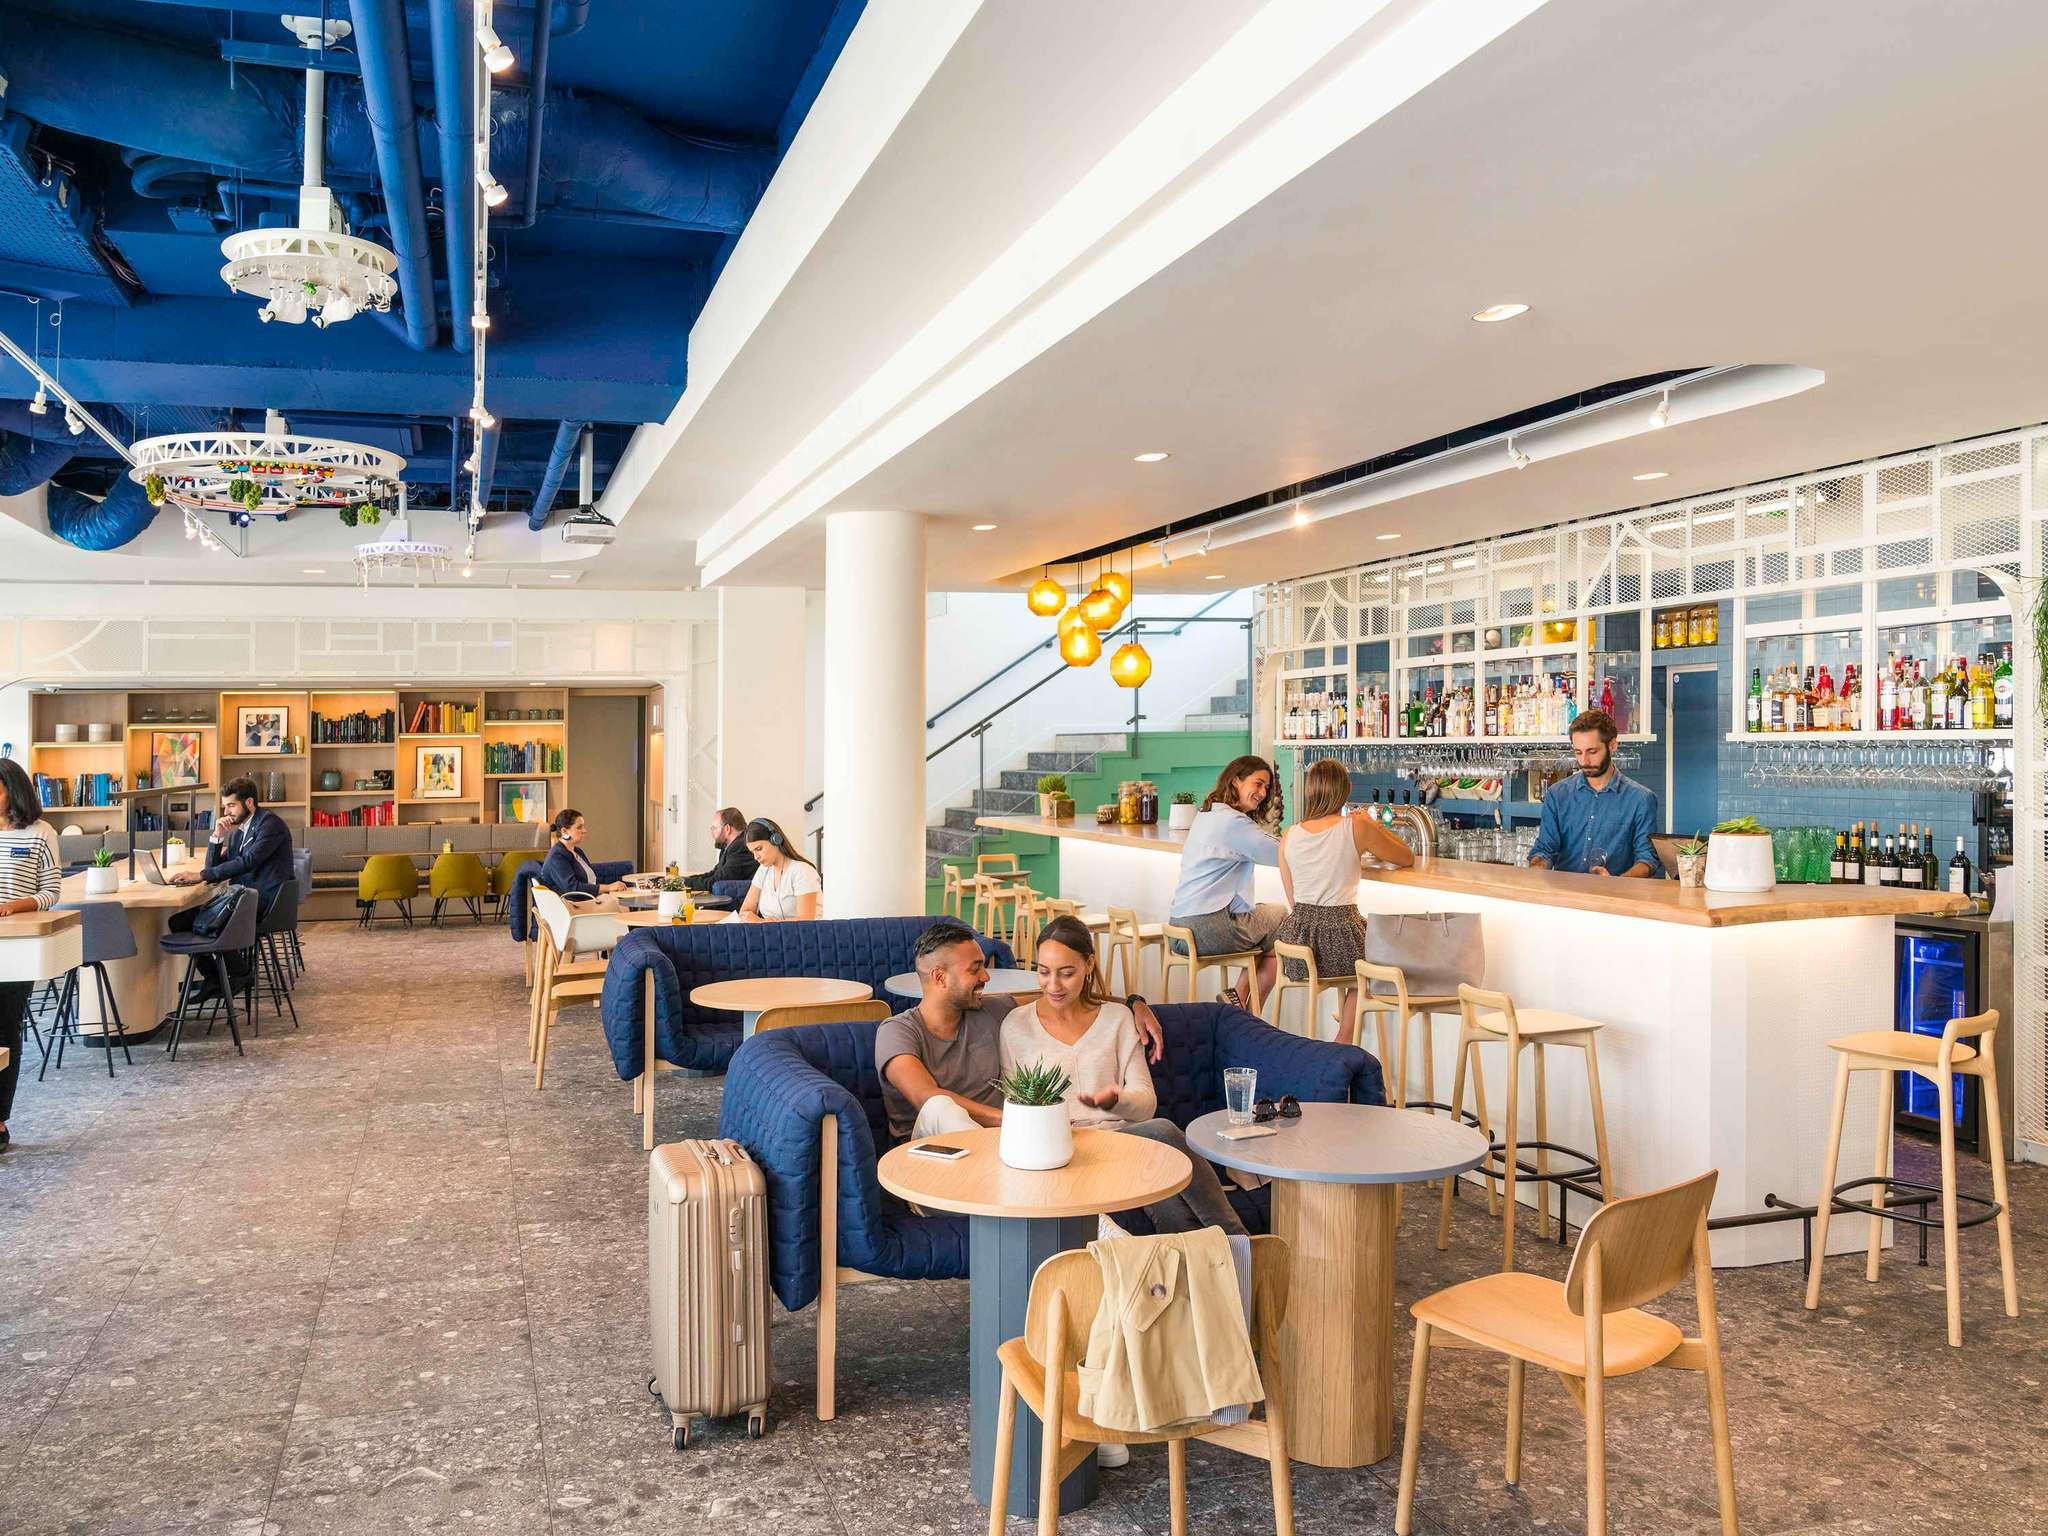 Hotel - Novotel Paris Centre Gare Montparnasse